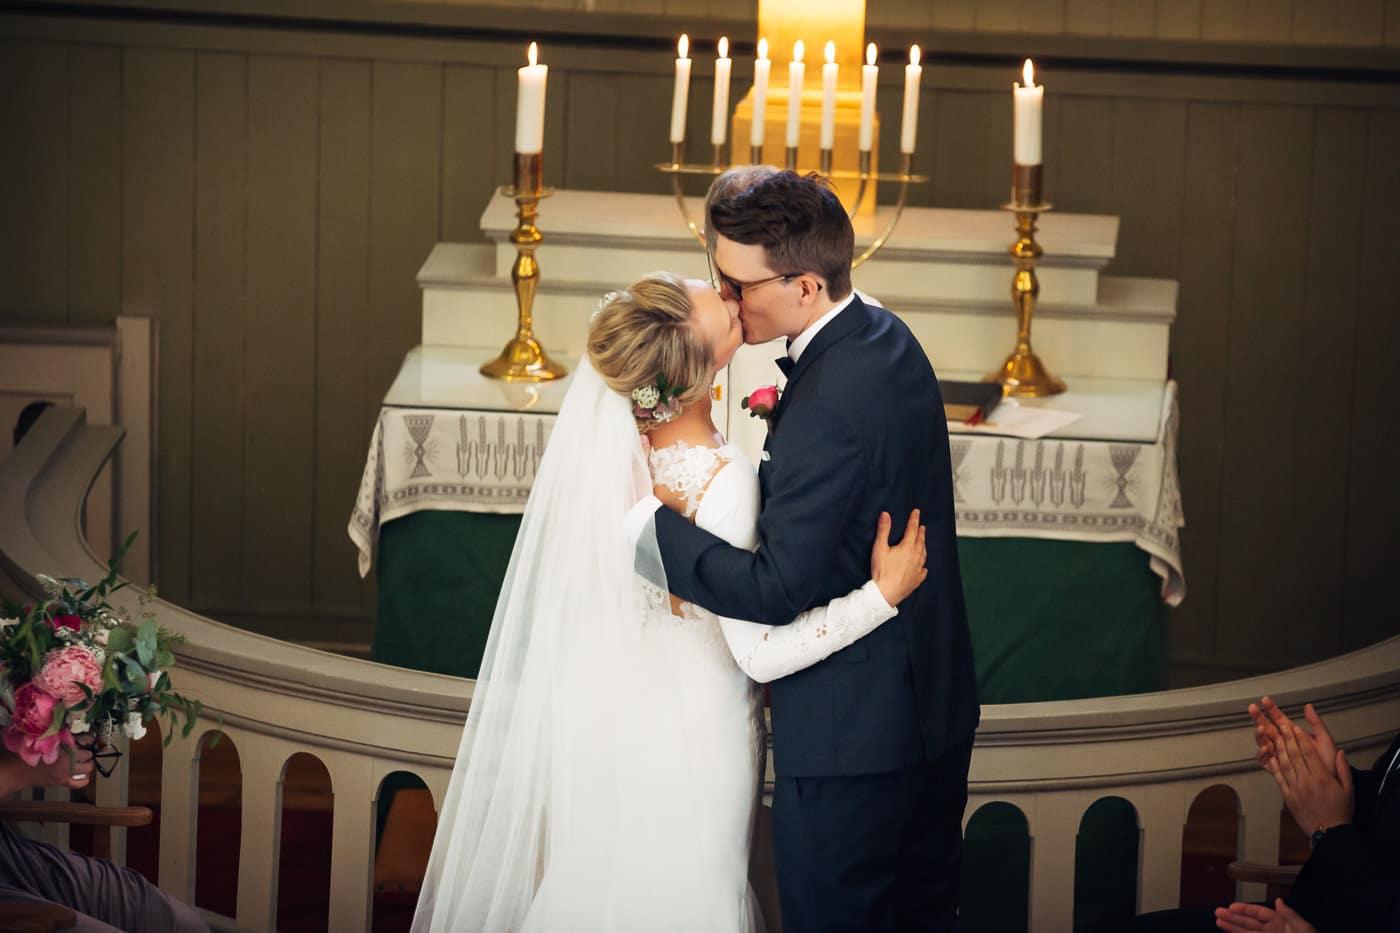 Karoline & Andreas - bryllup i Østfold med magiske detaljer Bryllup Fredrikstad Fotograf 23